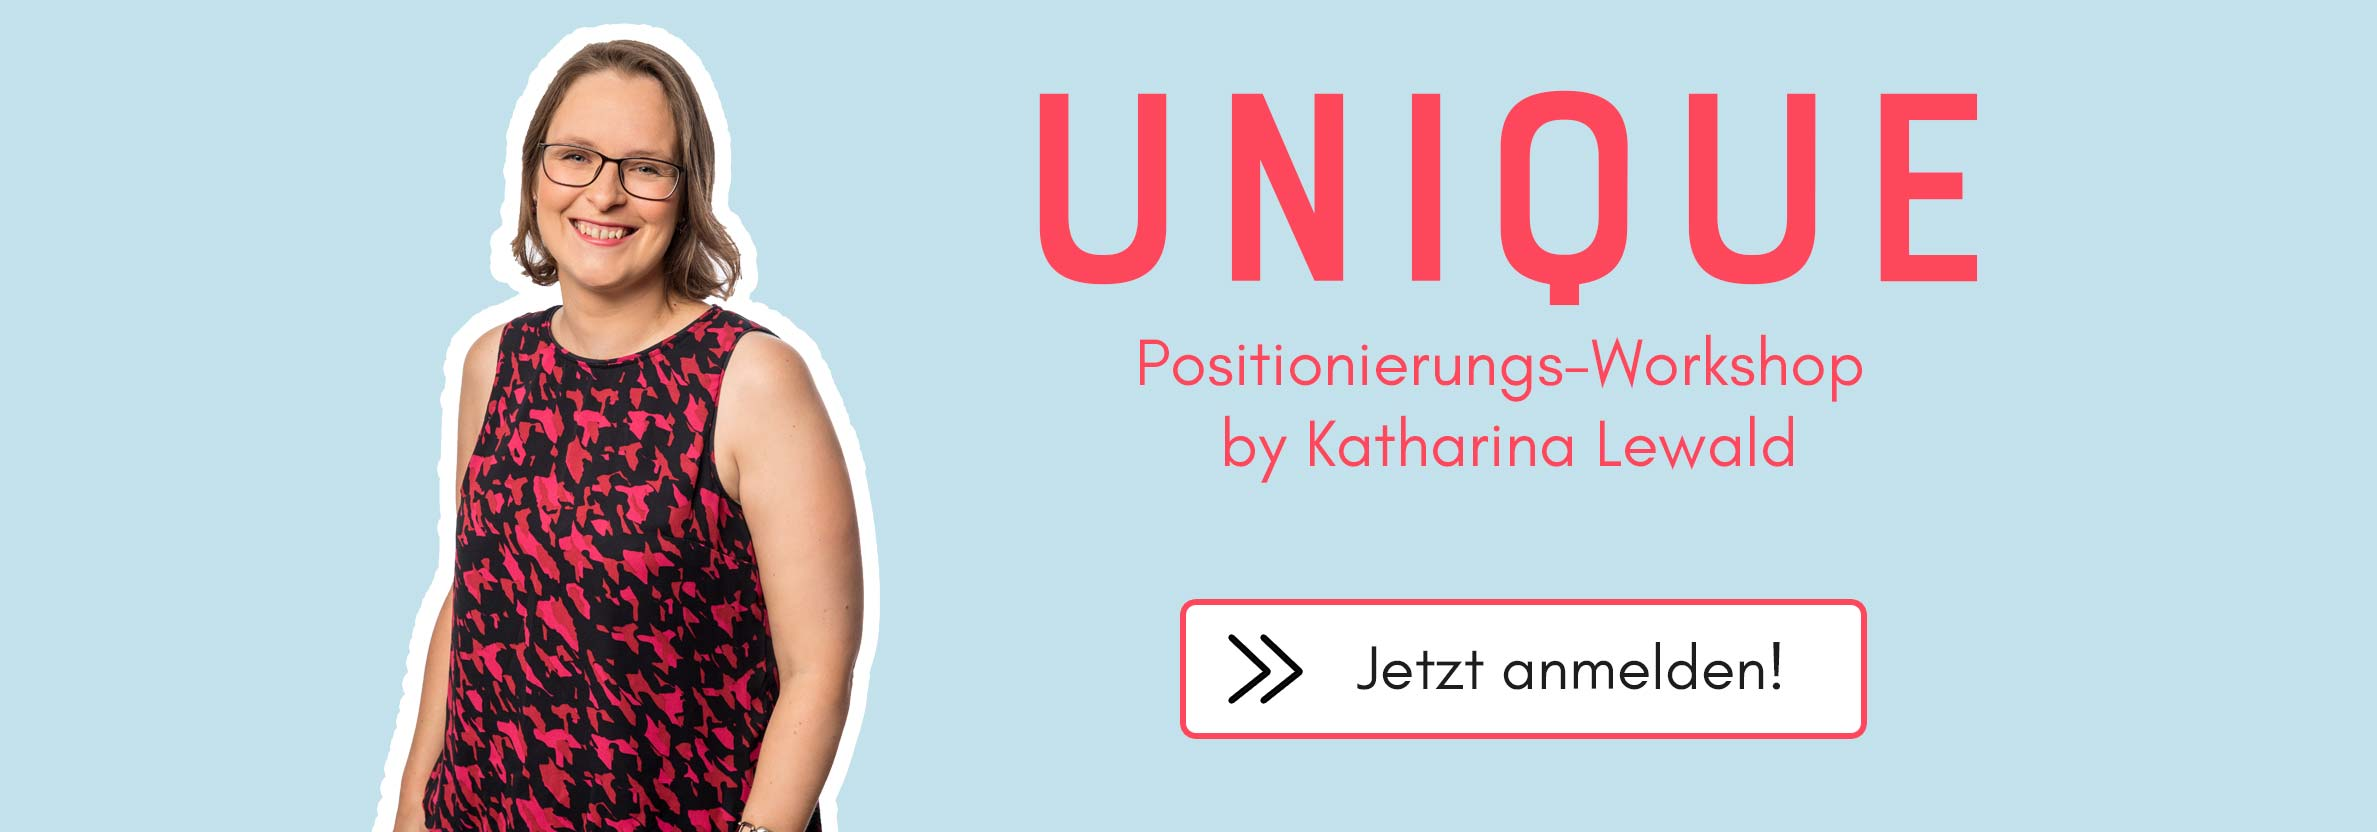 "Positionierungs Workshop ""Unique"" by Katharina Lewald"